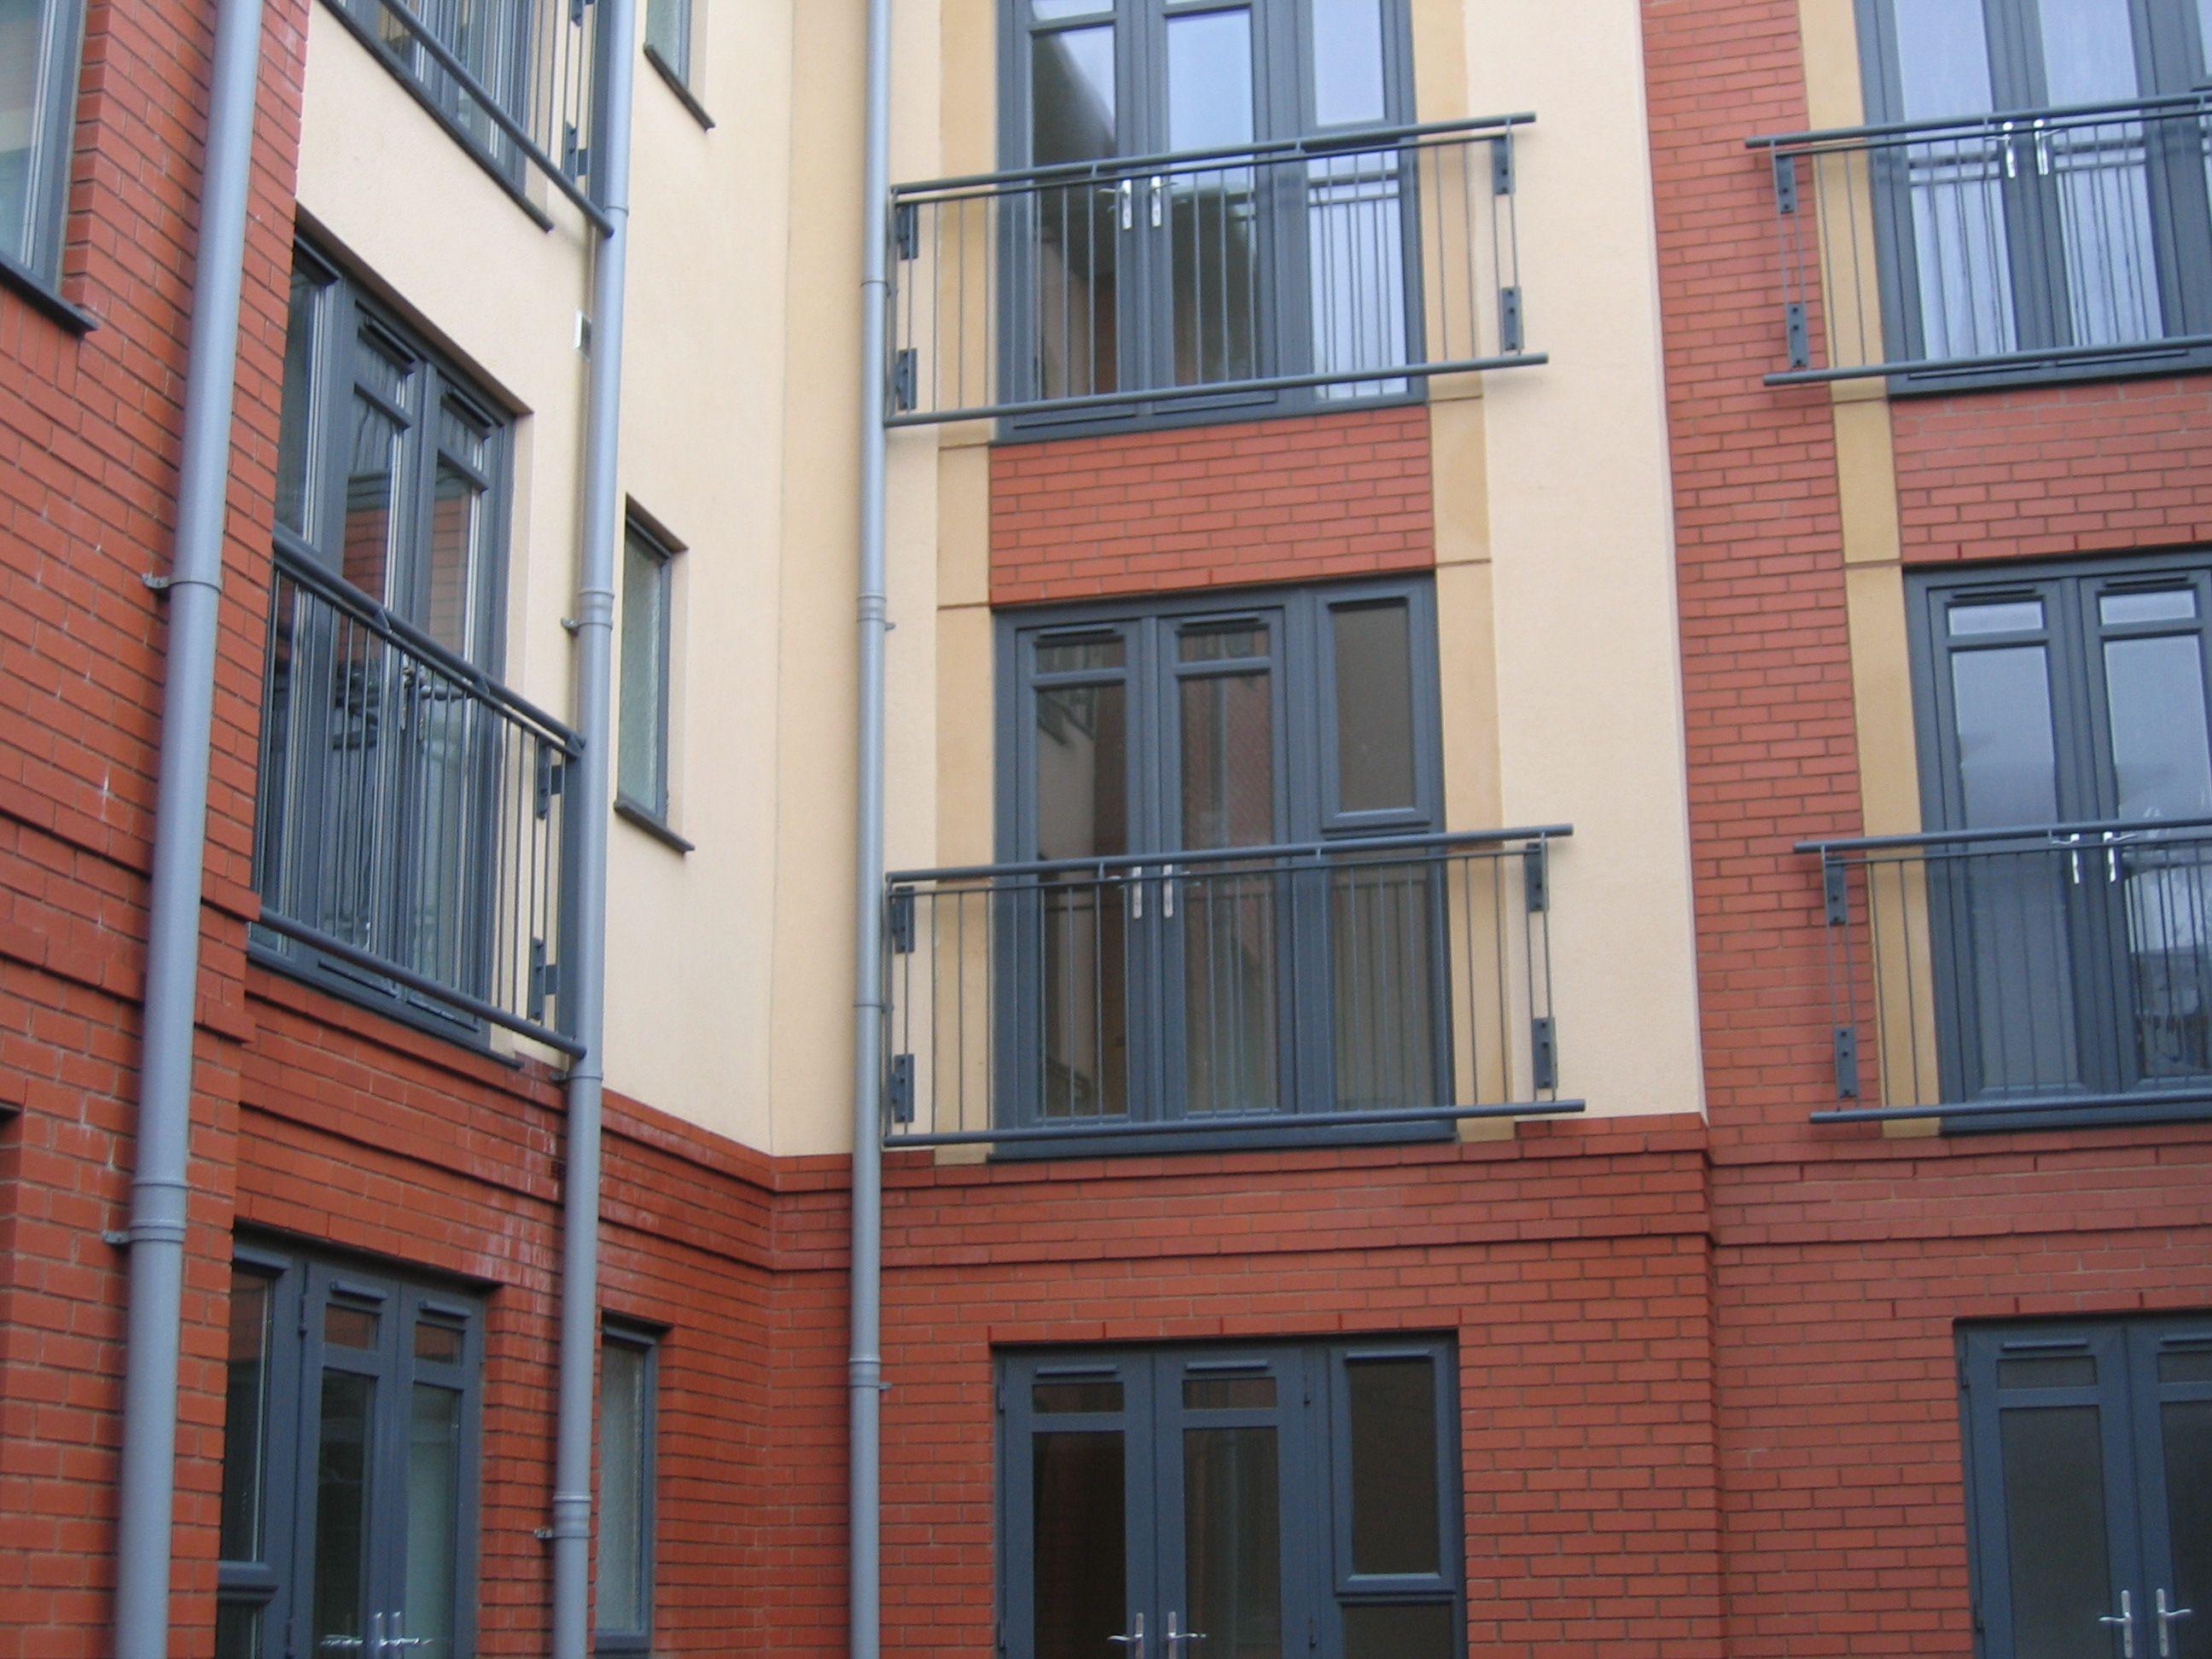 Metal Juliette Balcony Balustrade Powdercoated To Ral 7016